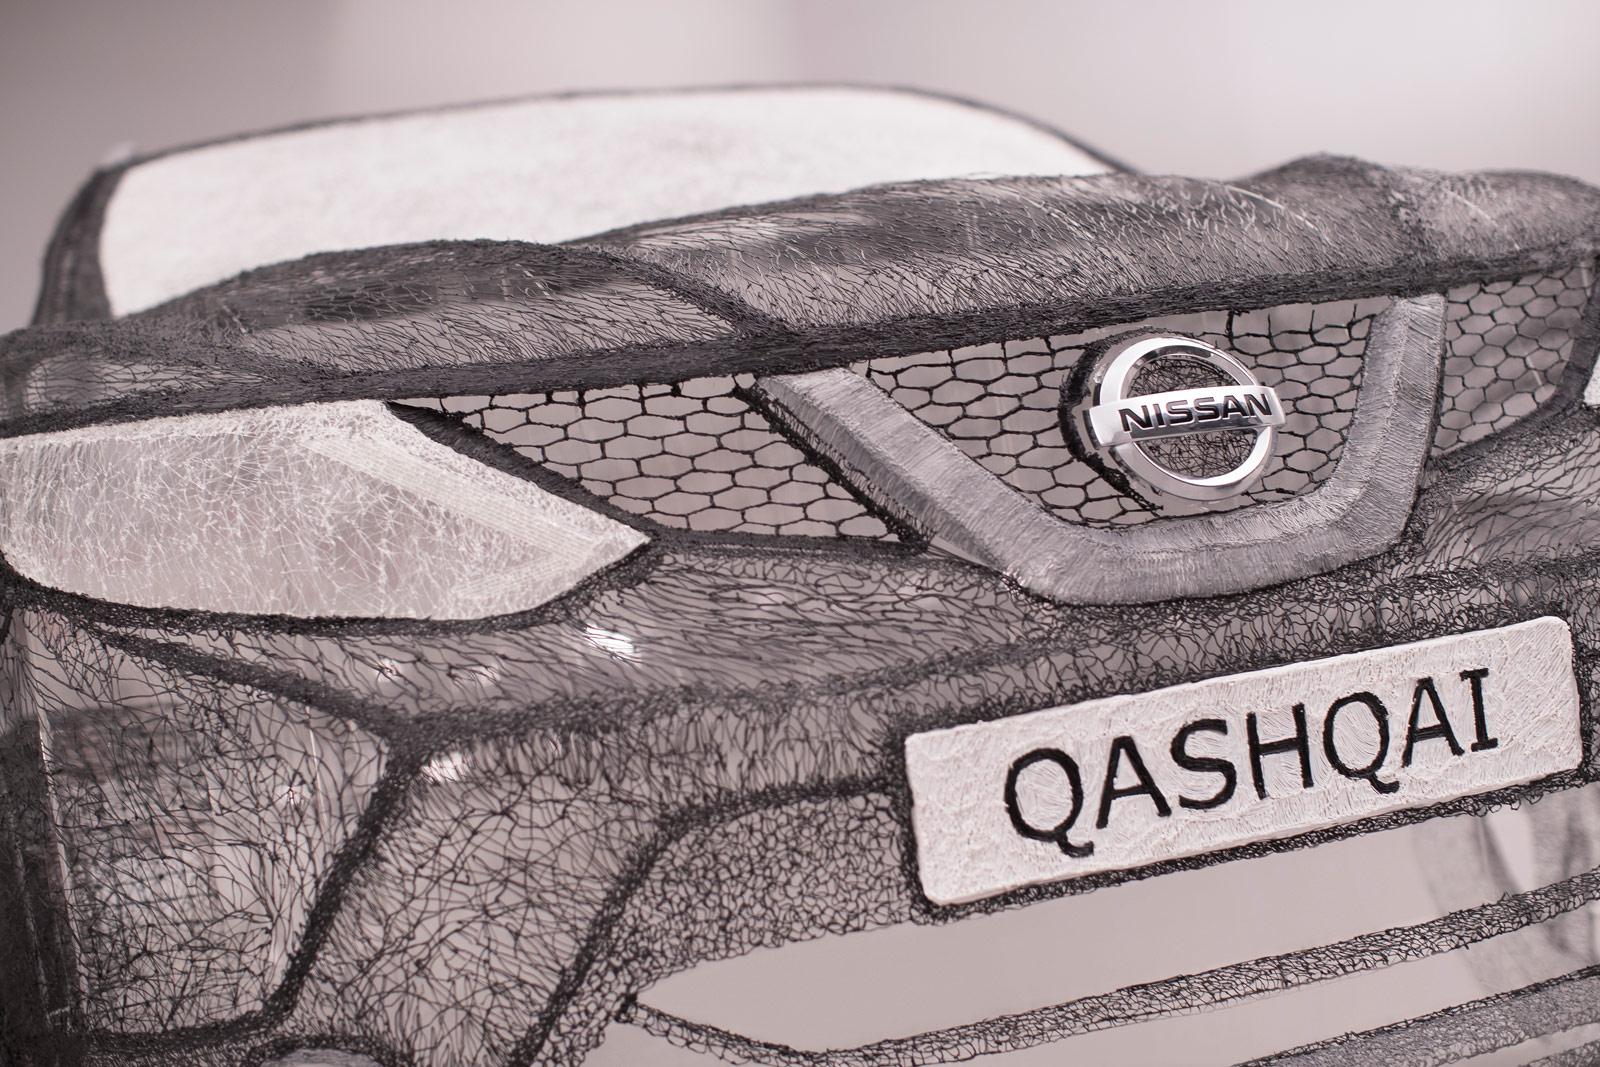 Nissan Draws Full-Sized Qashqai Black Edition Using 3Doodler 3D Pen